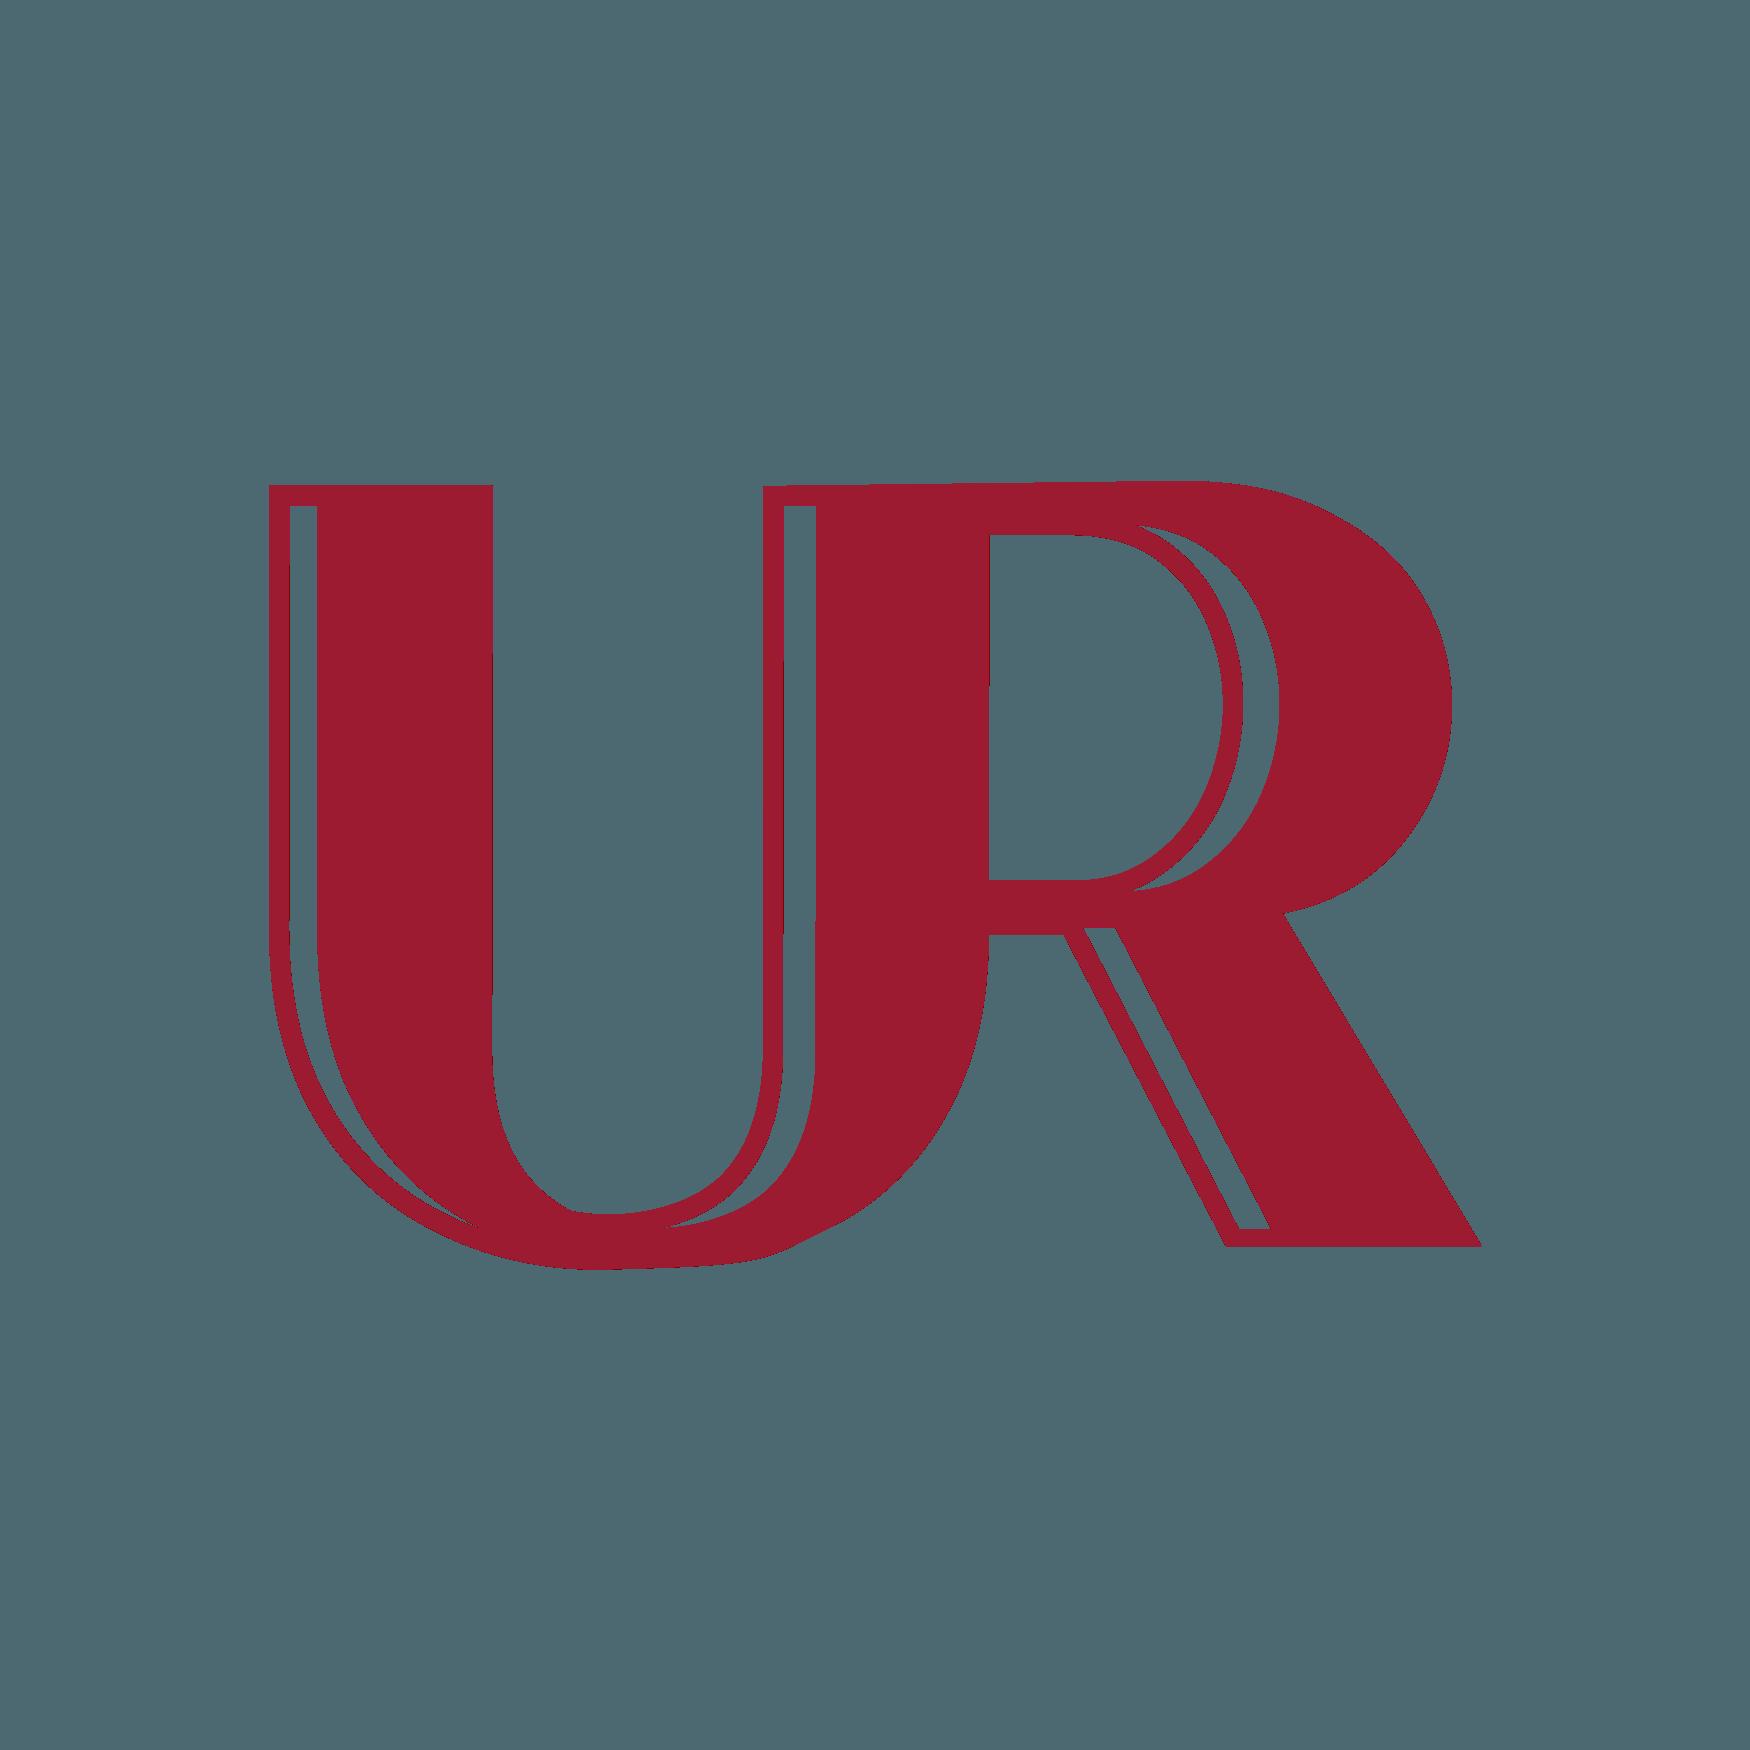 urpresence.com